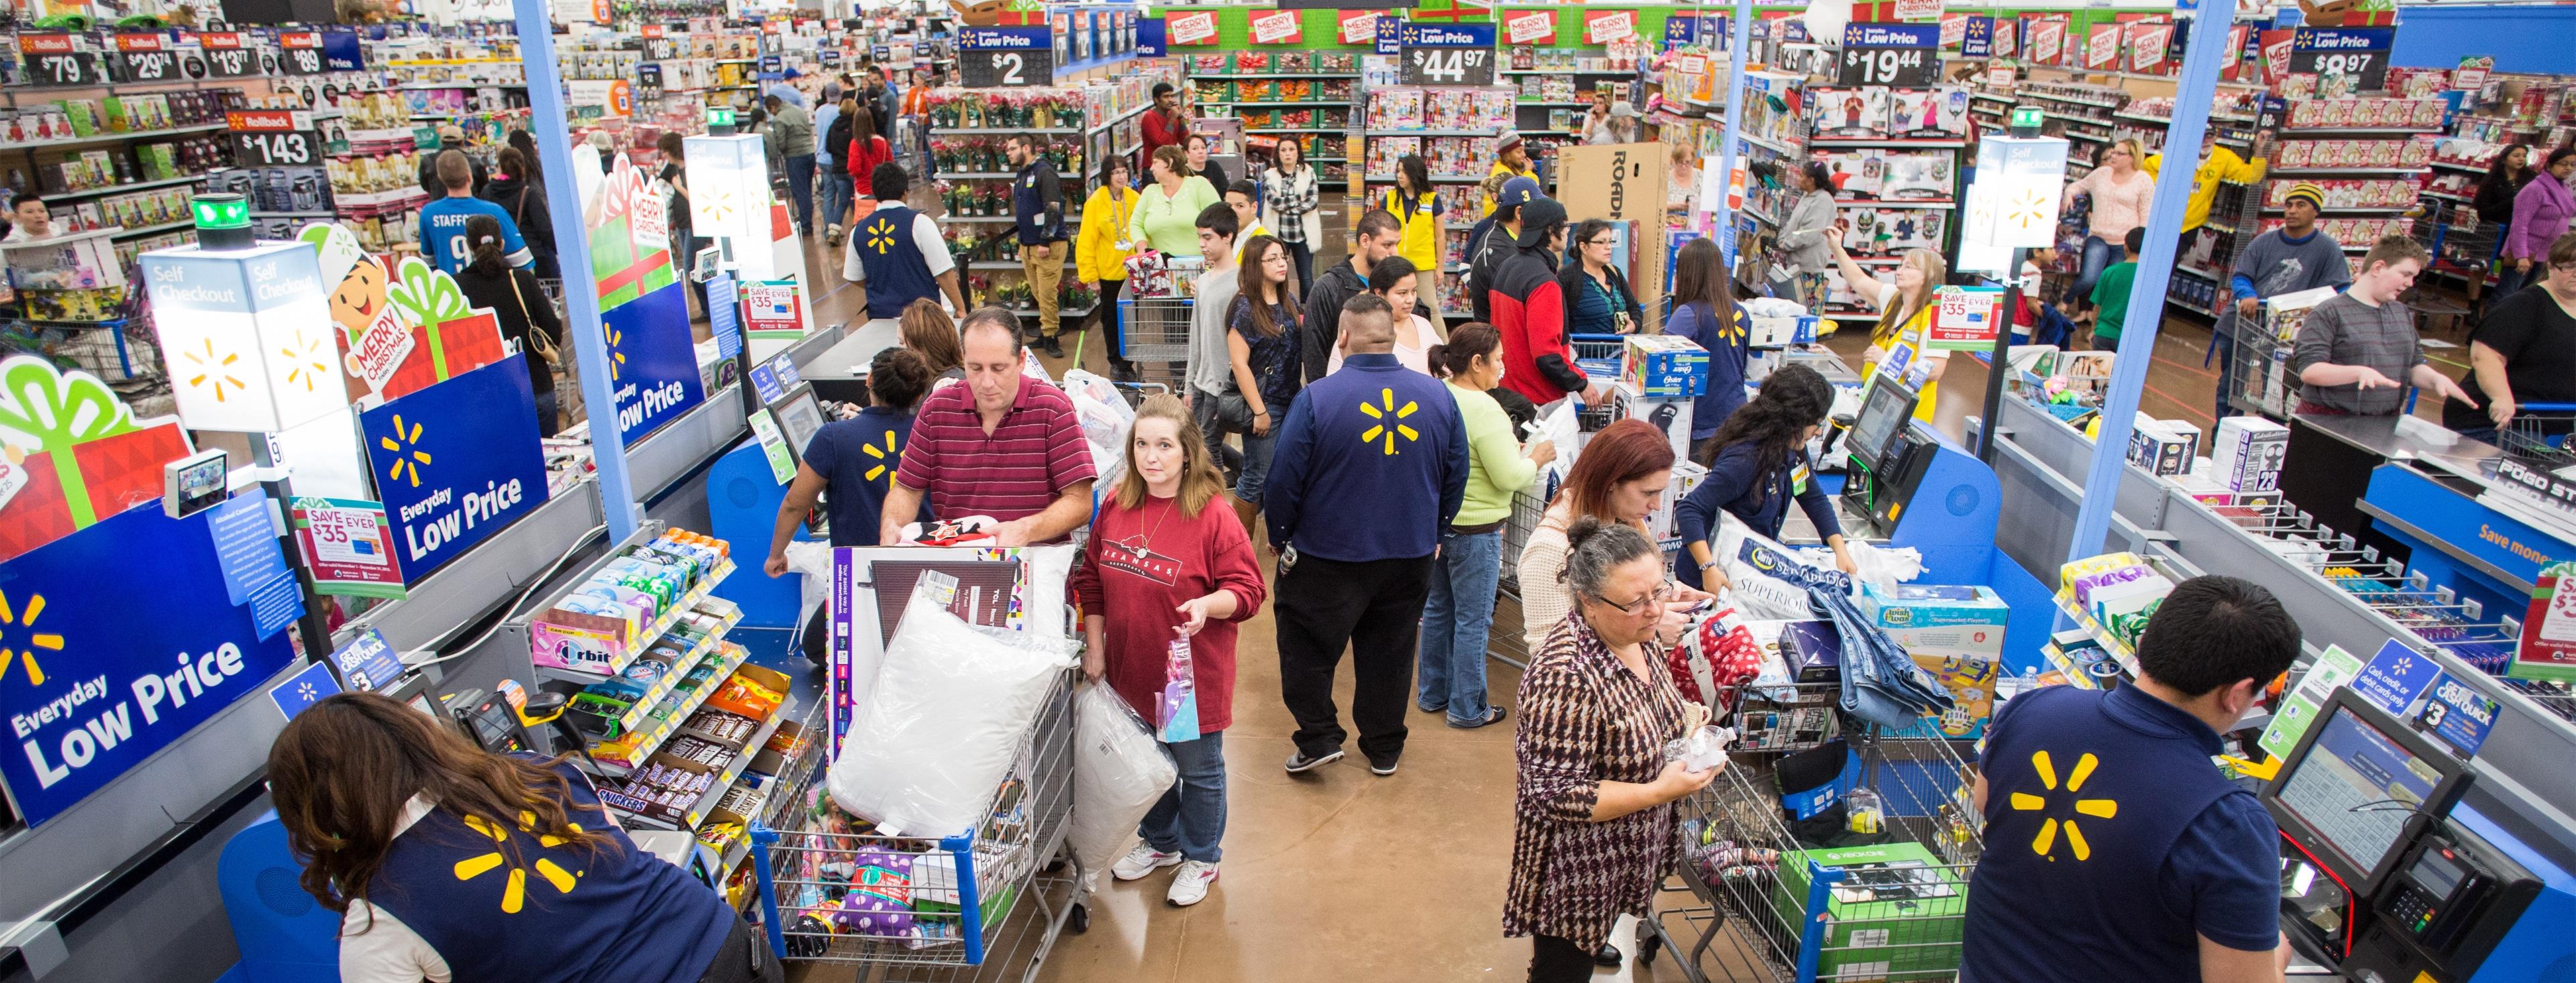 Walmart. Image: Fortune.